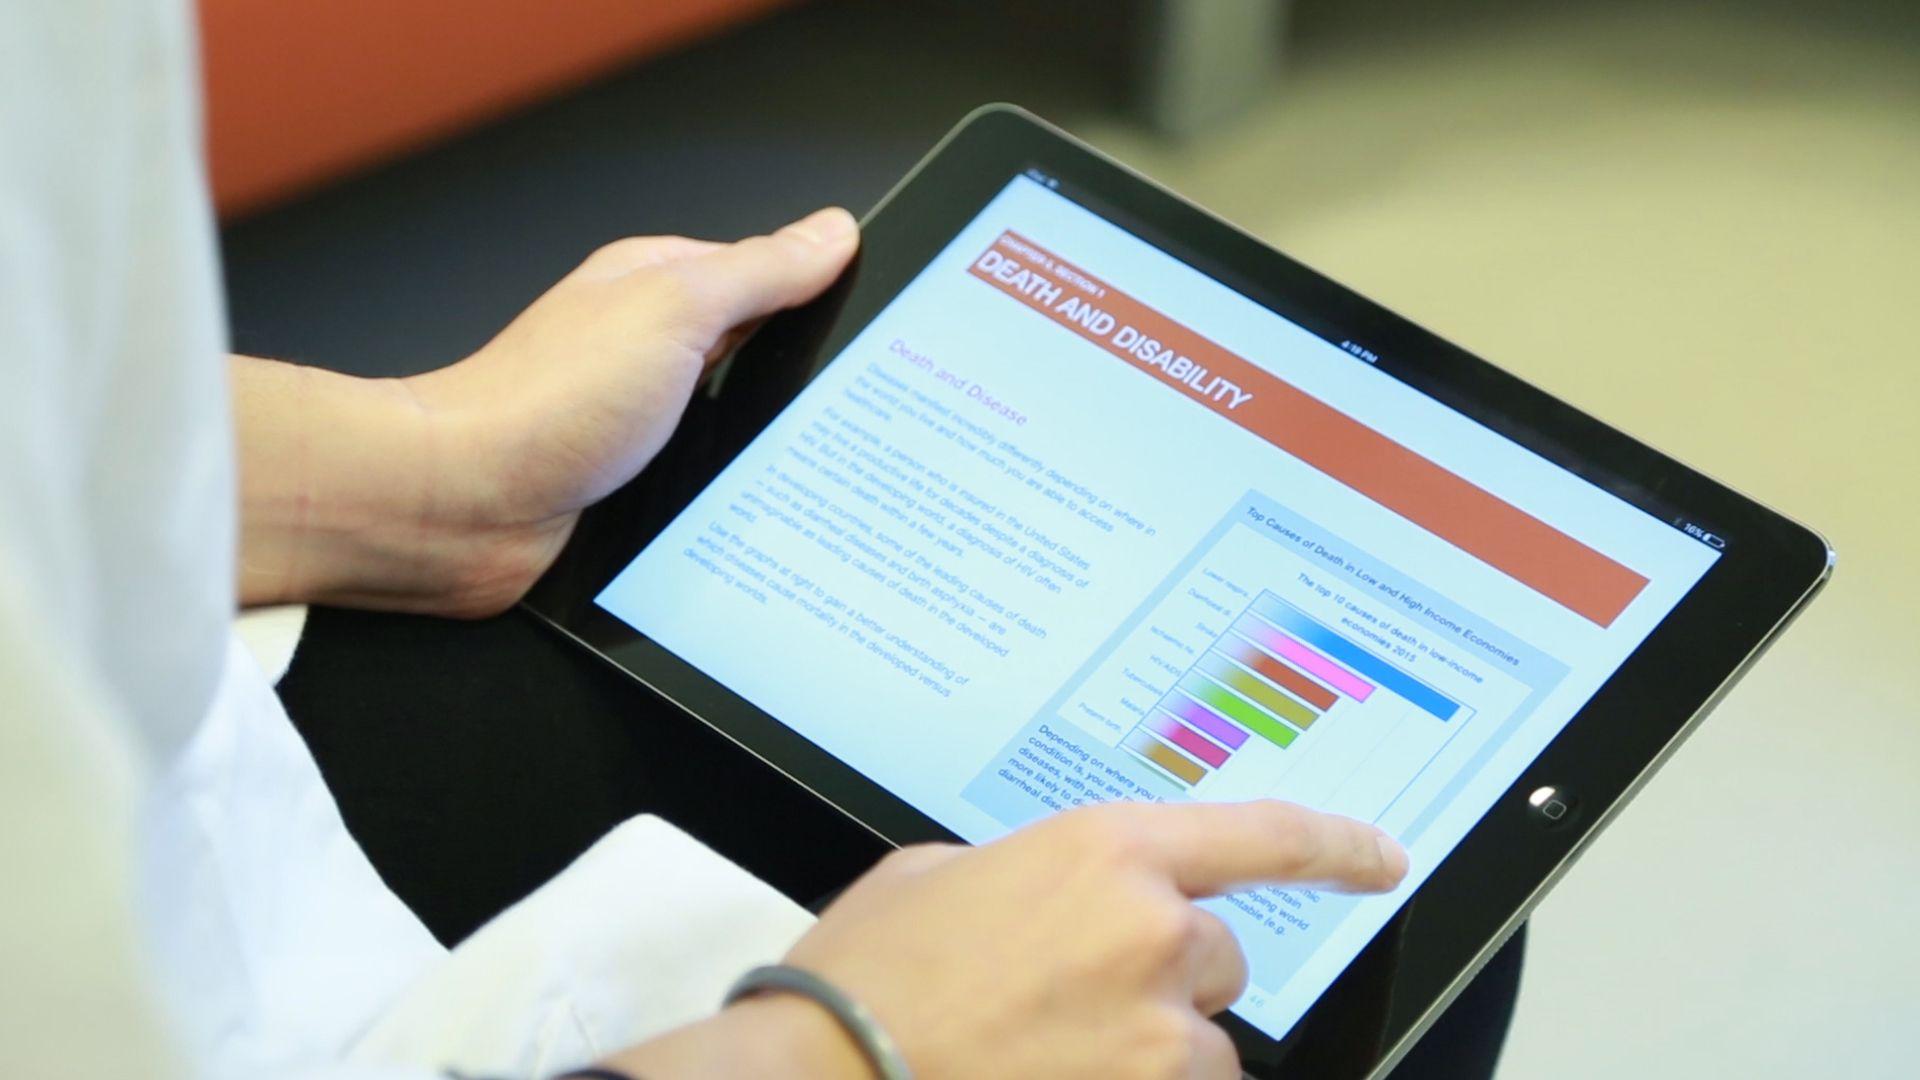 Global Health iBook